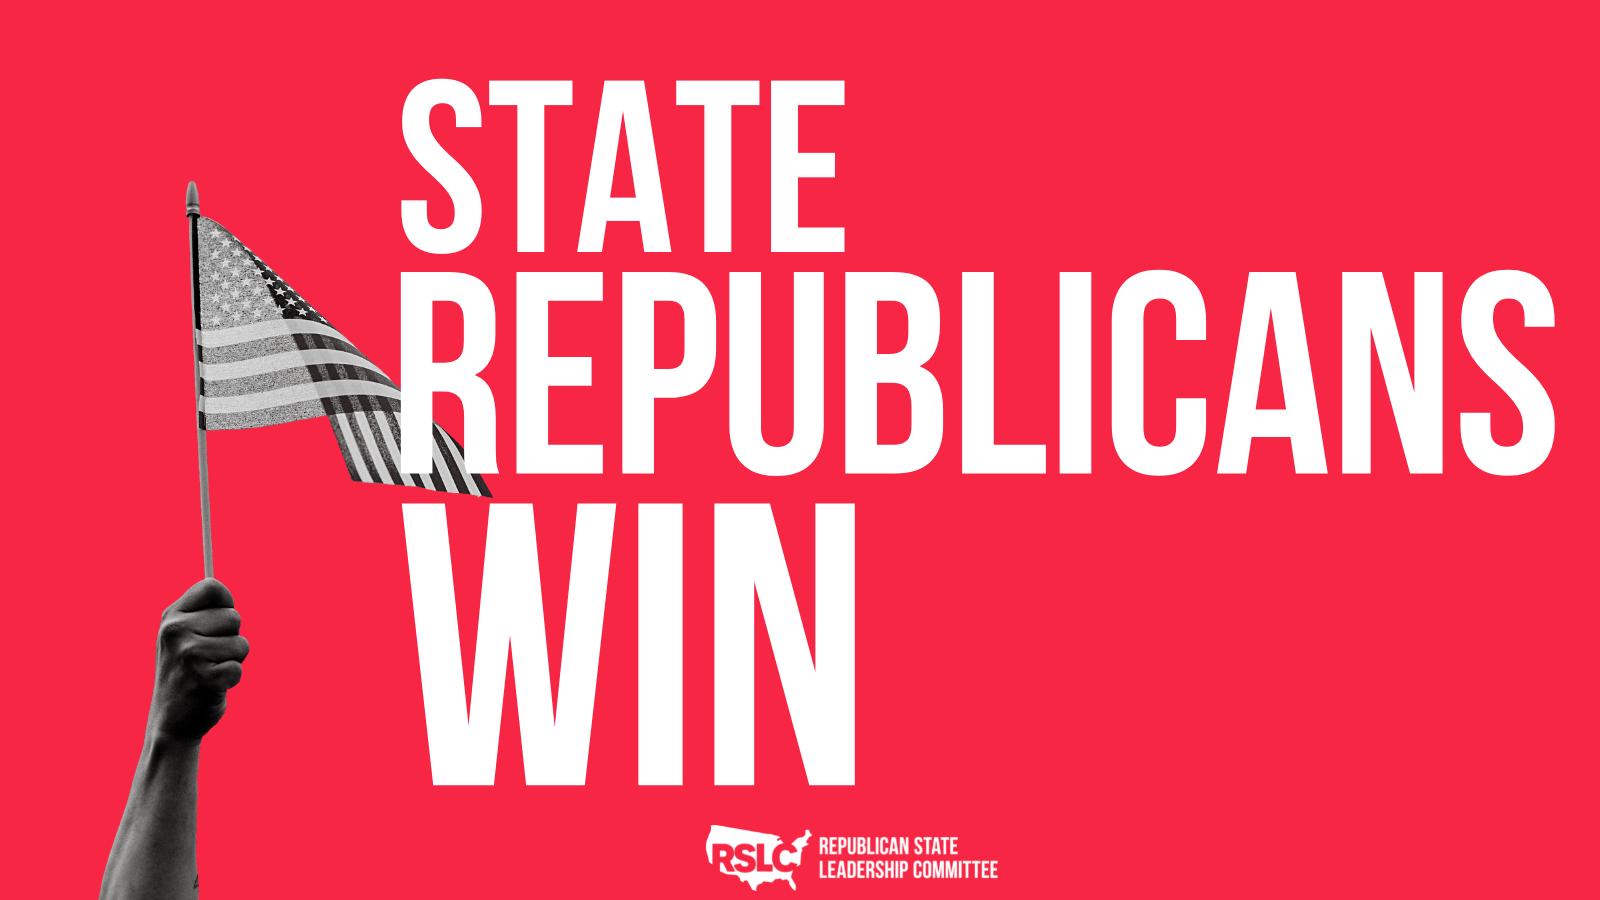 State republicans win